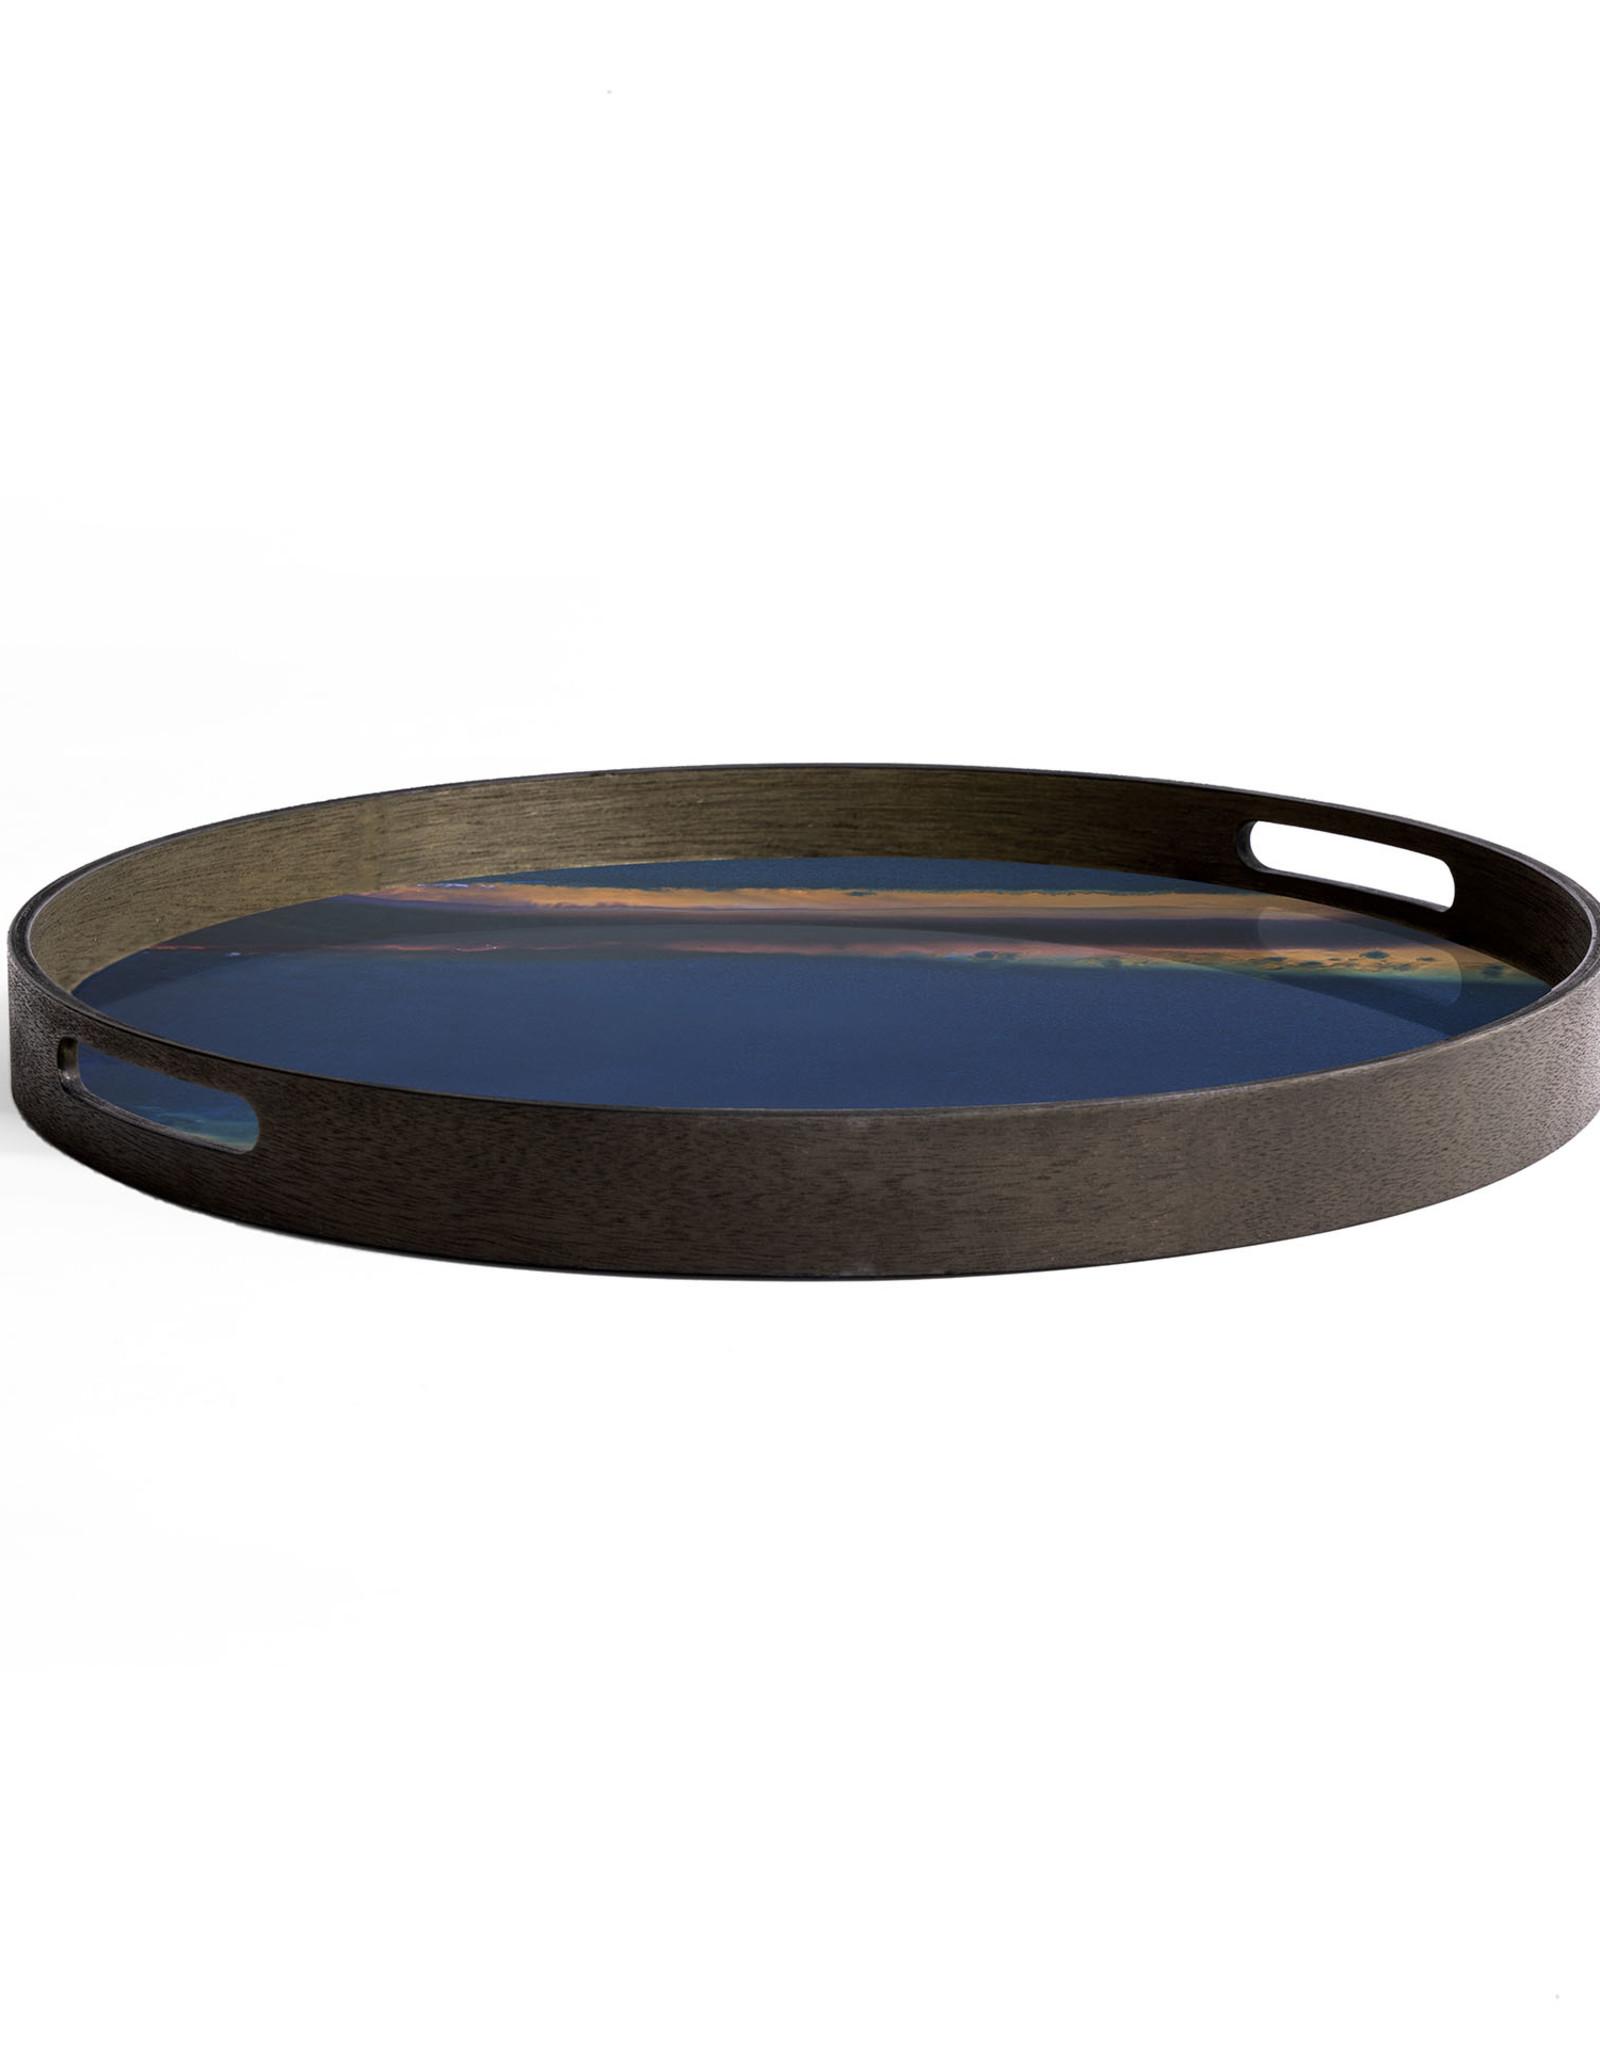 Indigo Organic glass tray - round - S 19 x 19 x 2